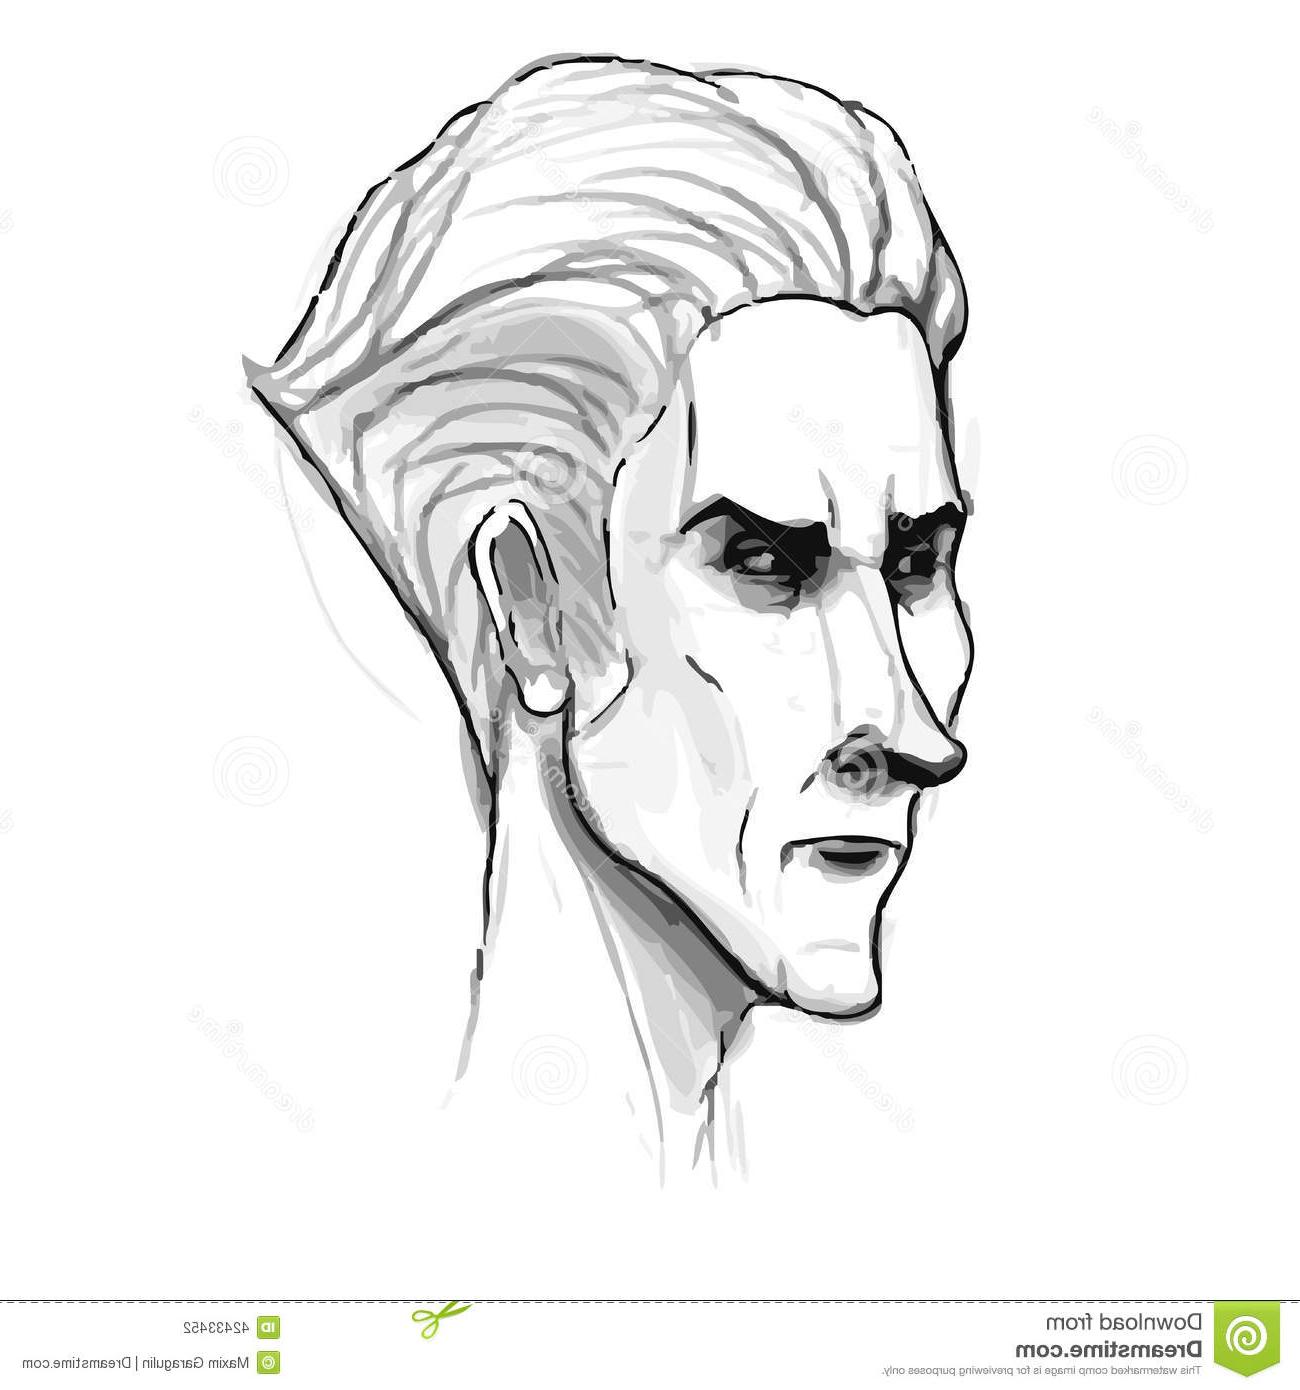 1300x1390 Abstract Men Face Pencil Sketch 10 Incredible Pencil Hyperrealist